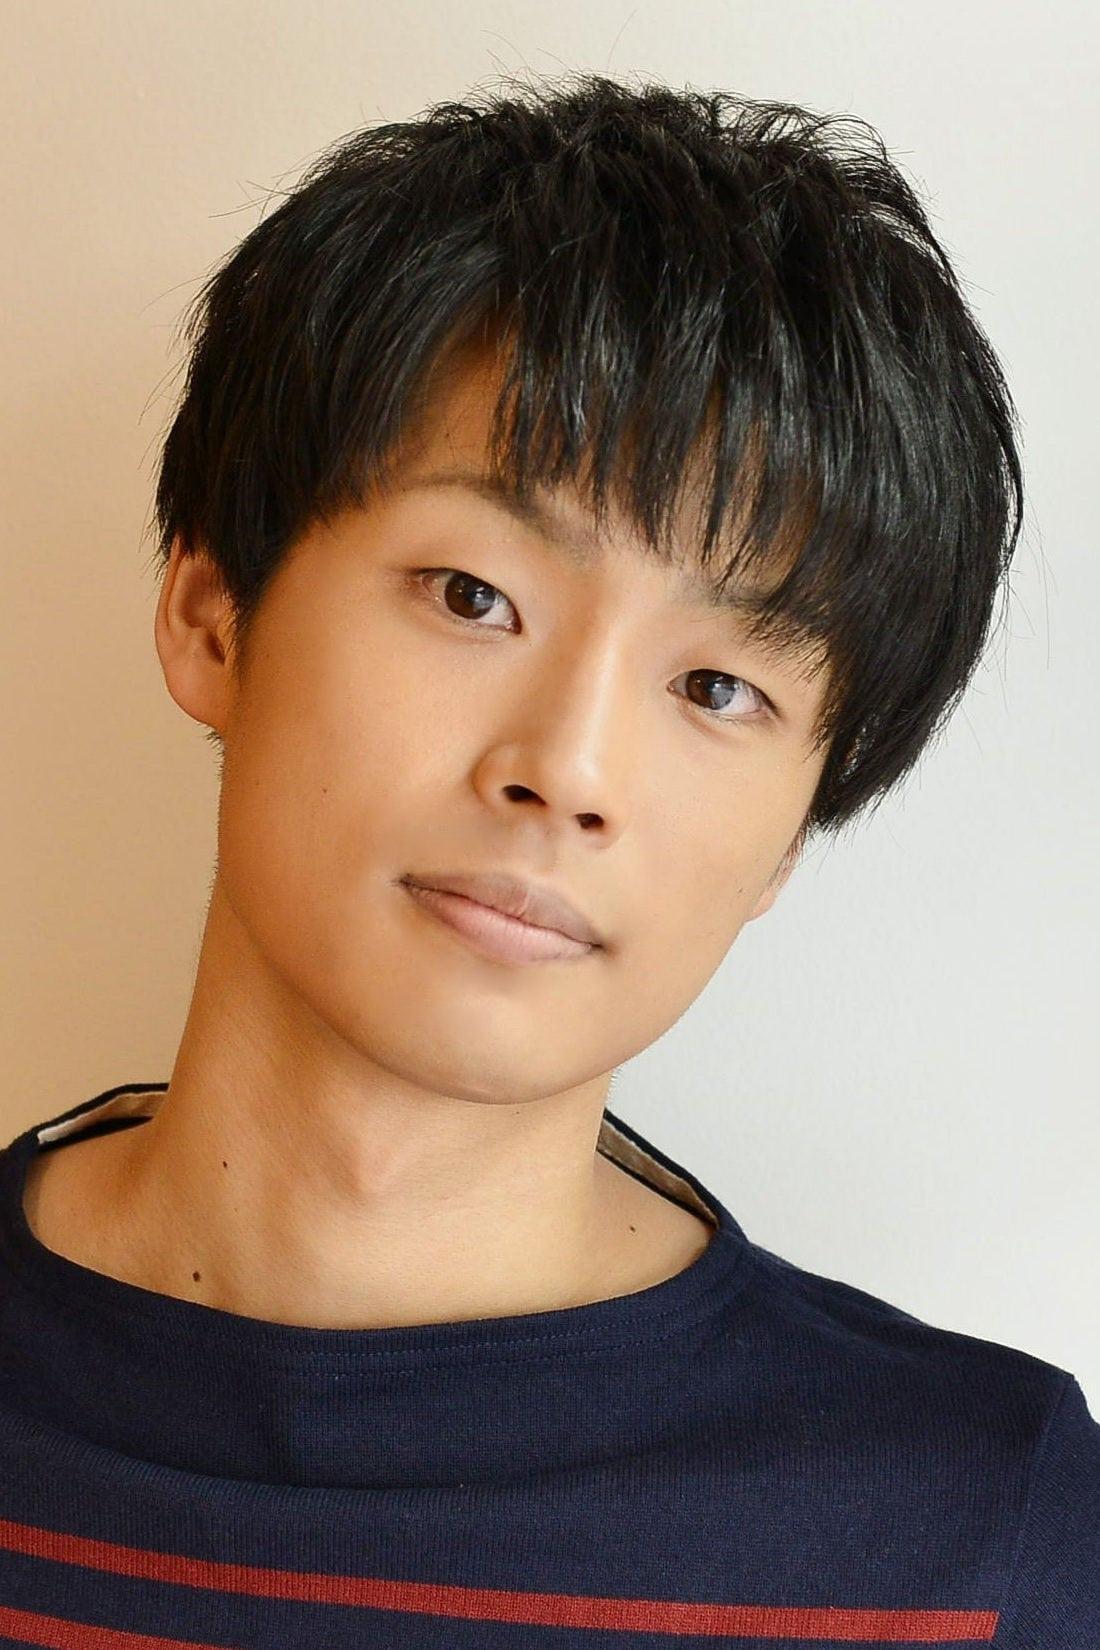 Kento Hama